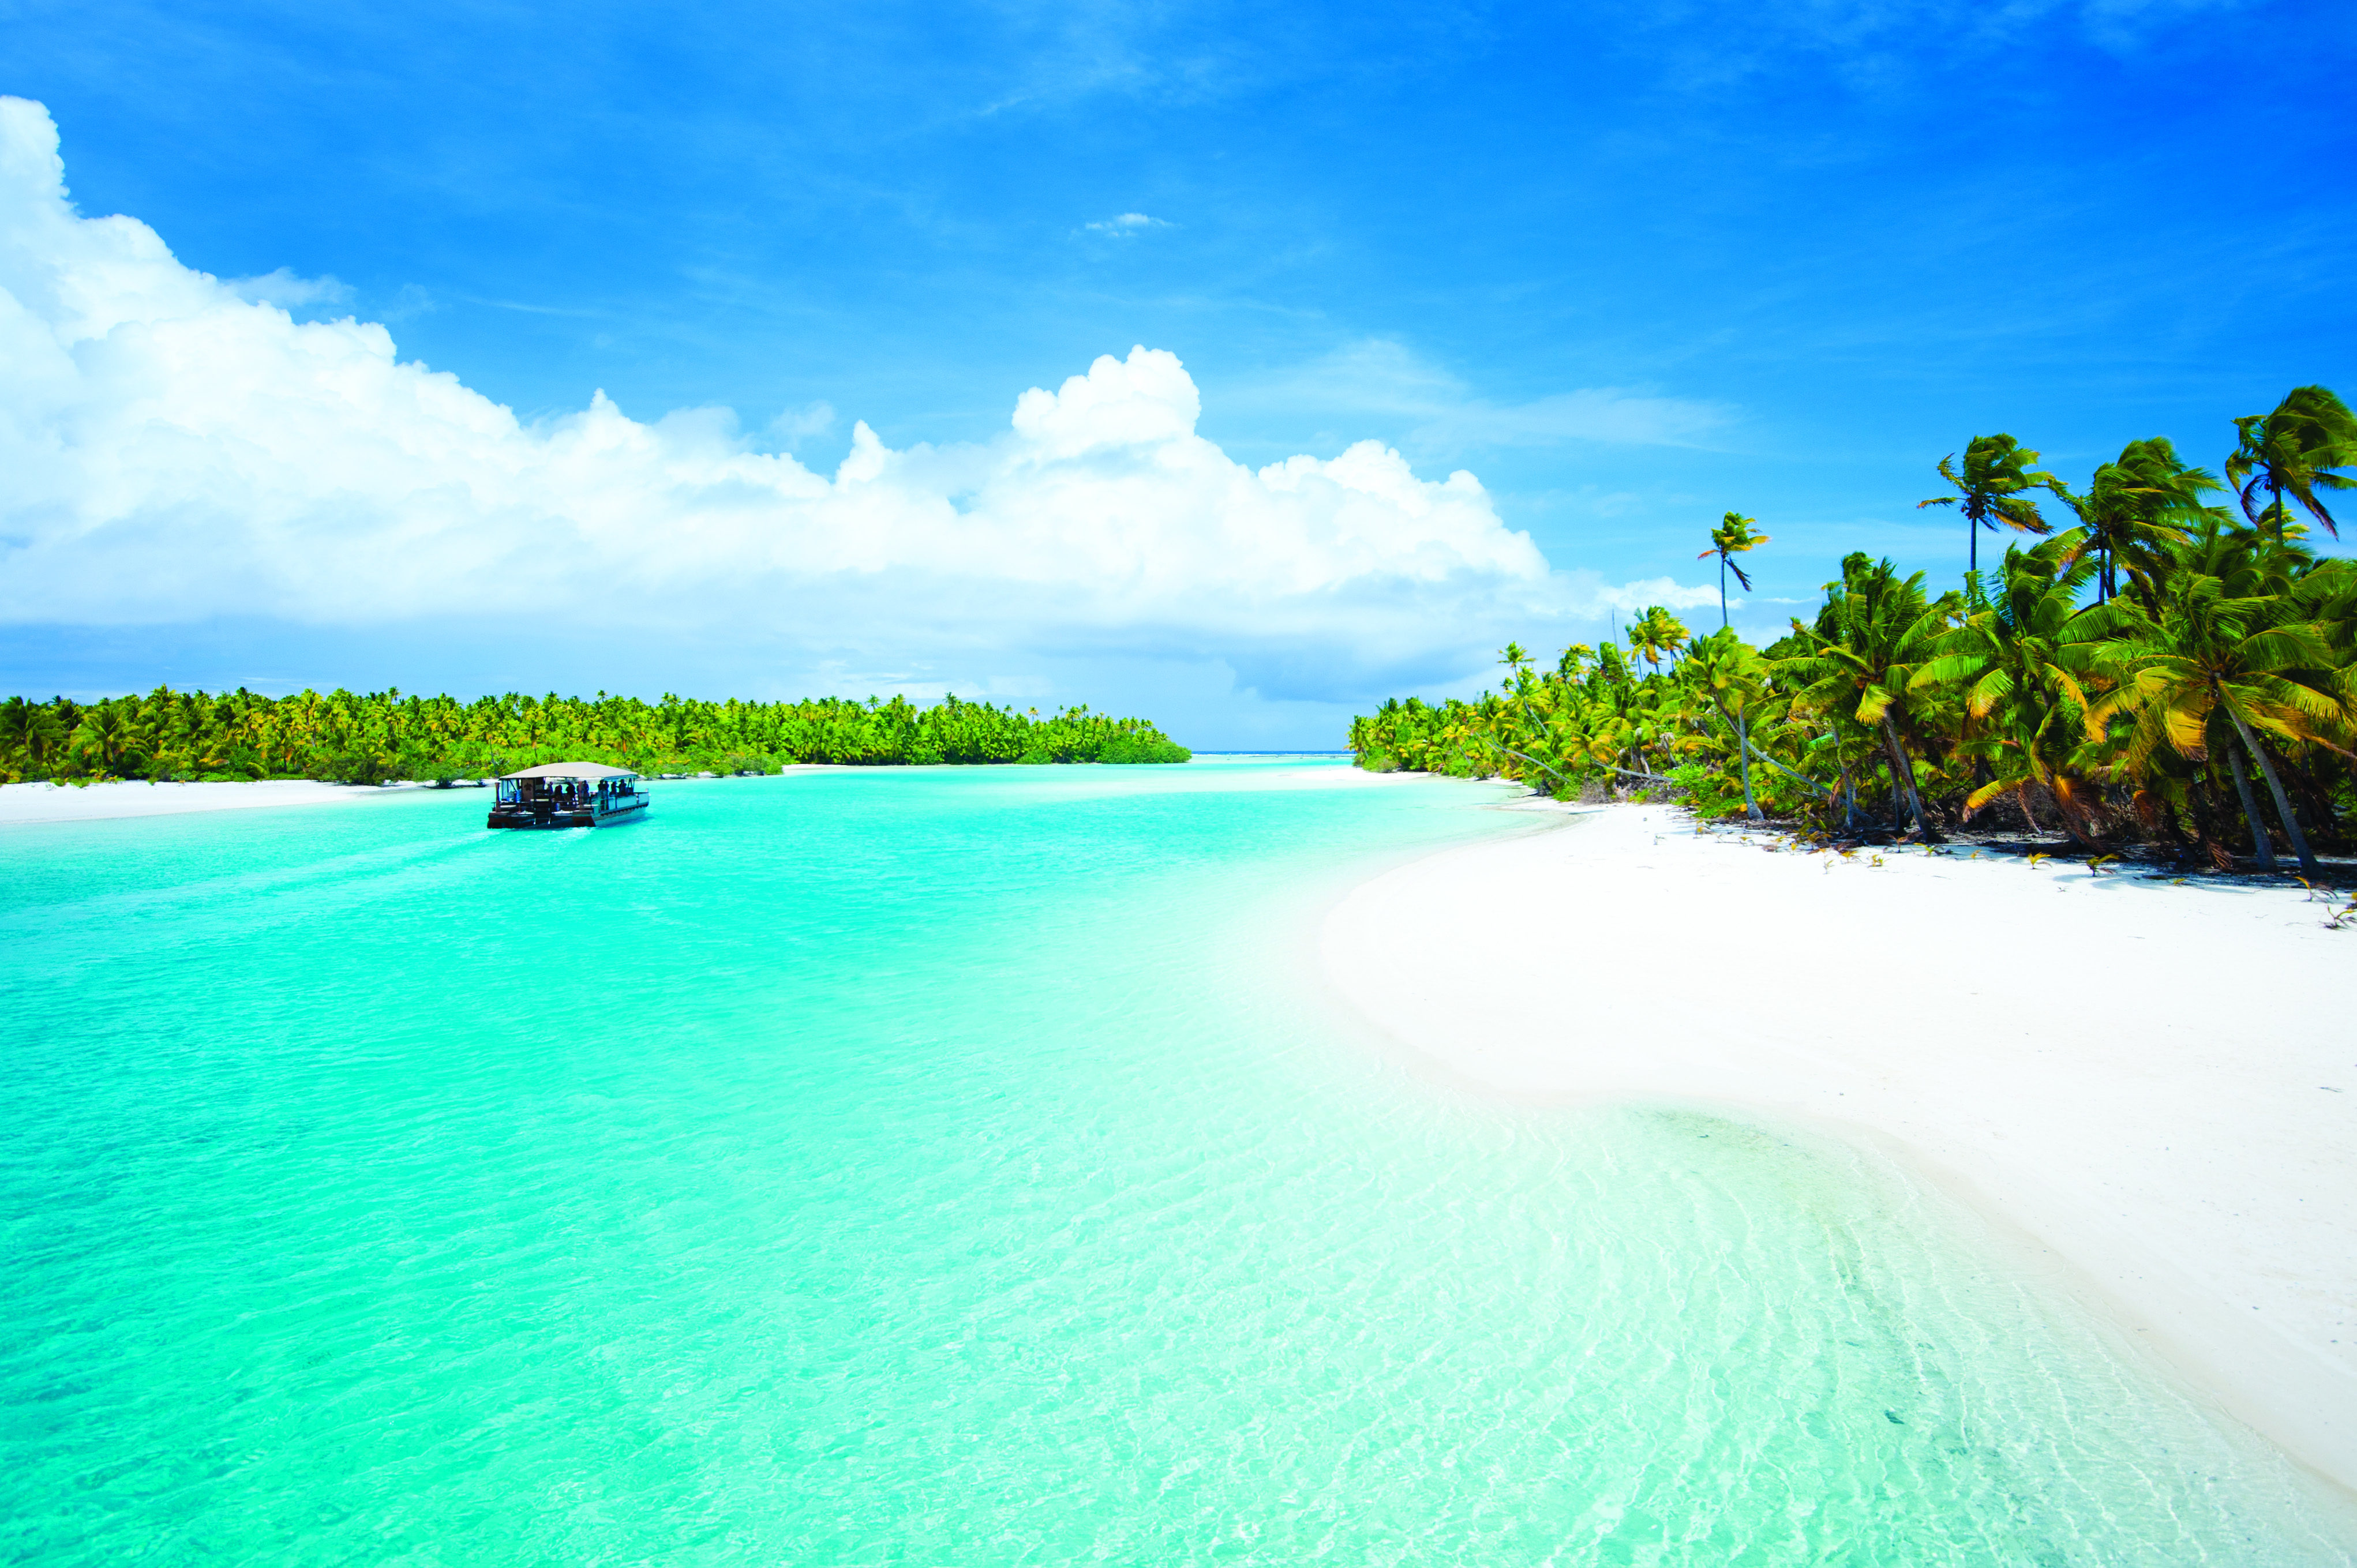 Aitutaki Lagoon, one of the finest beaches in the world